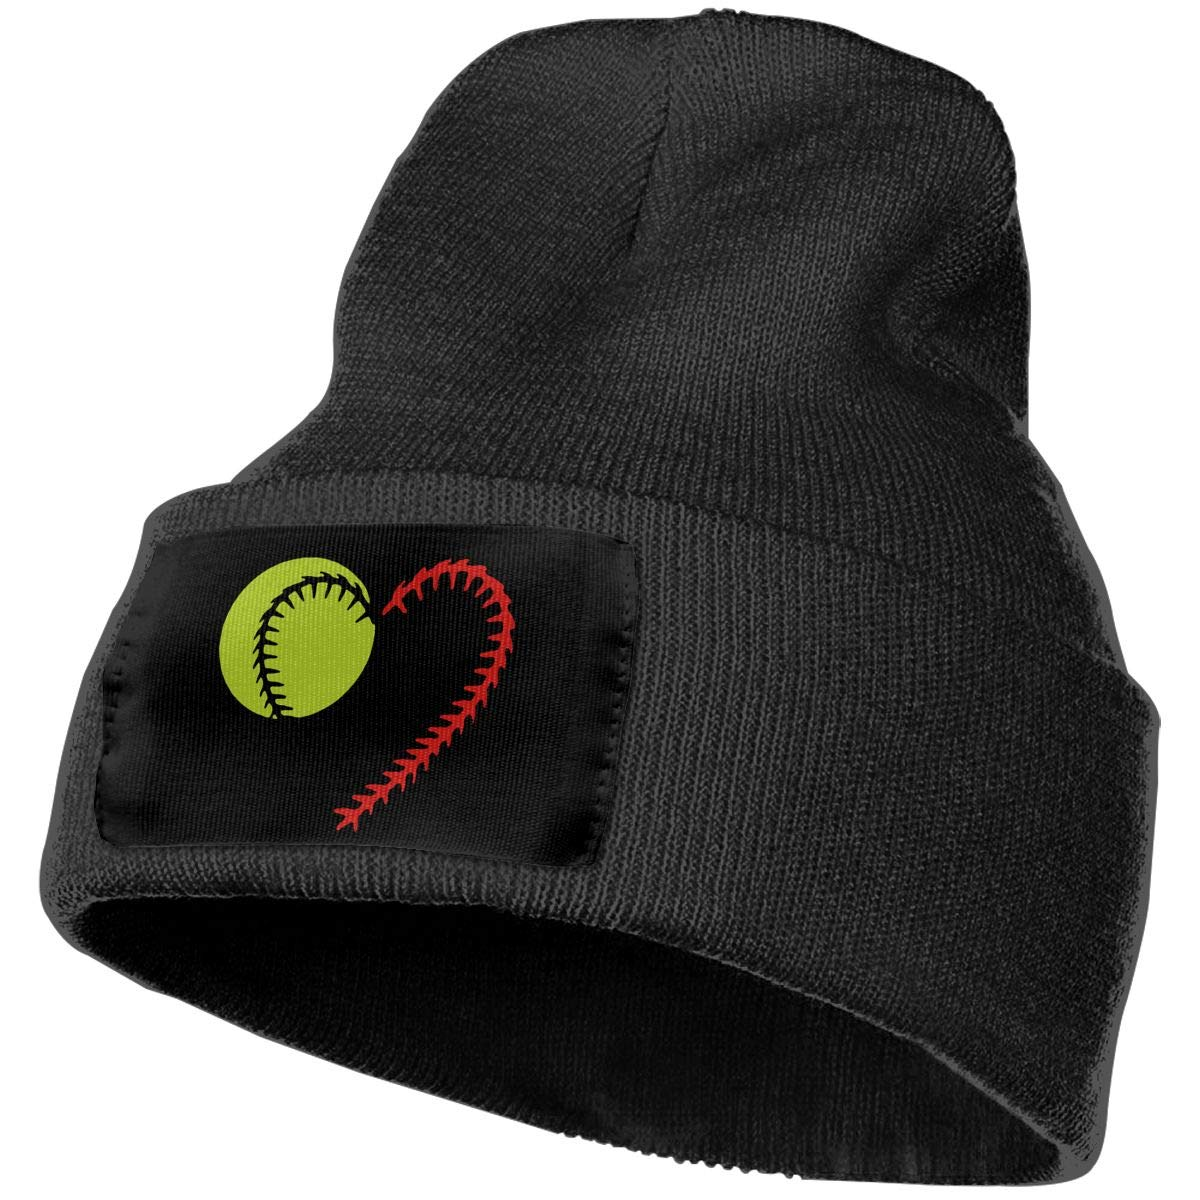 Baseball Softball Lace Outdoor Winter Ski Knit Beanie Hat Cap for Men//Women